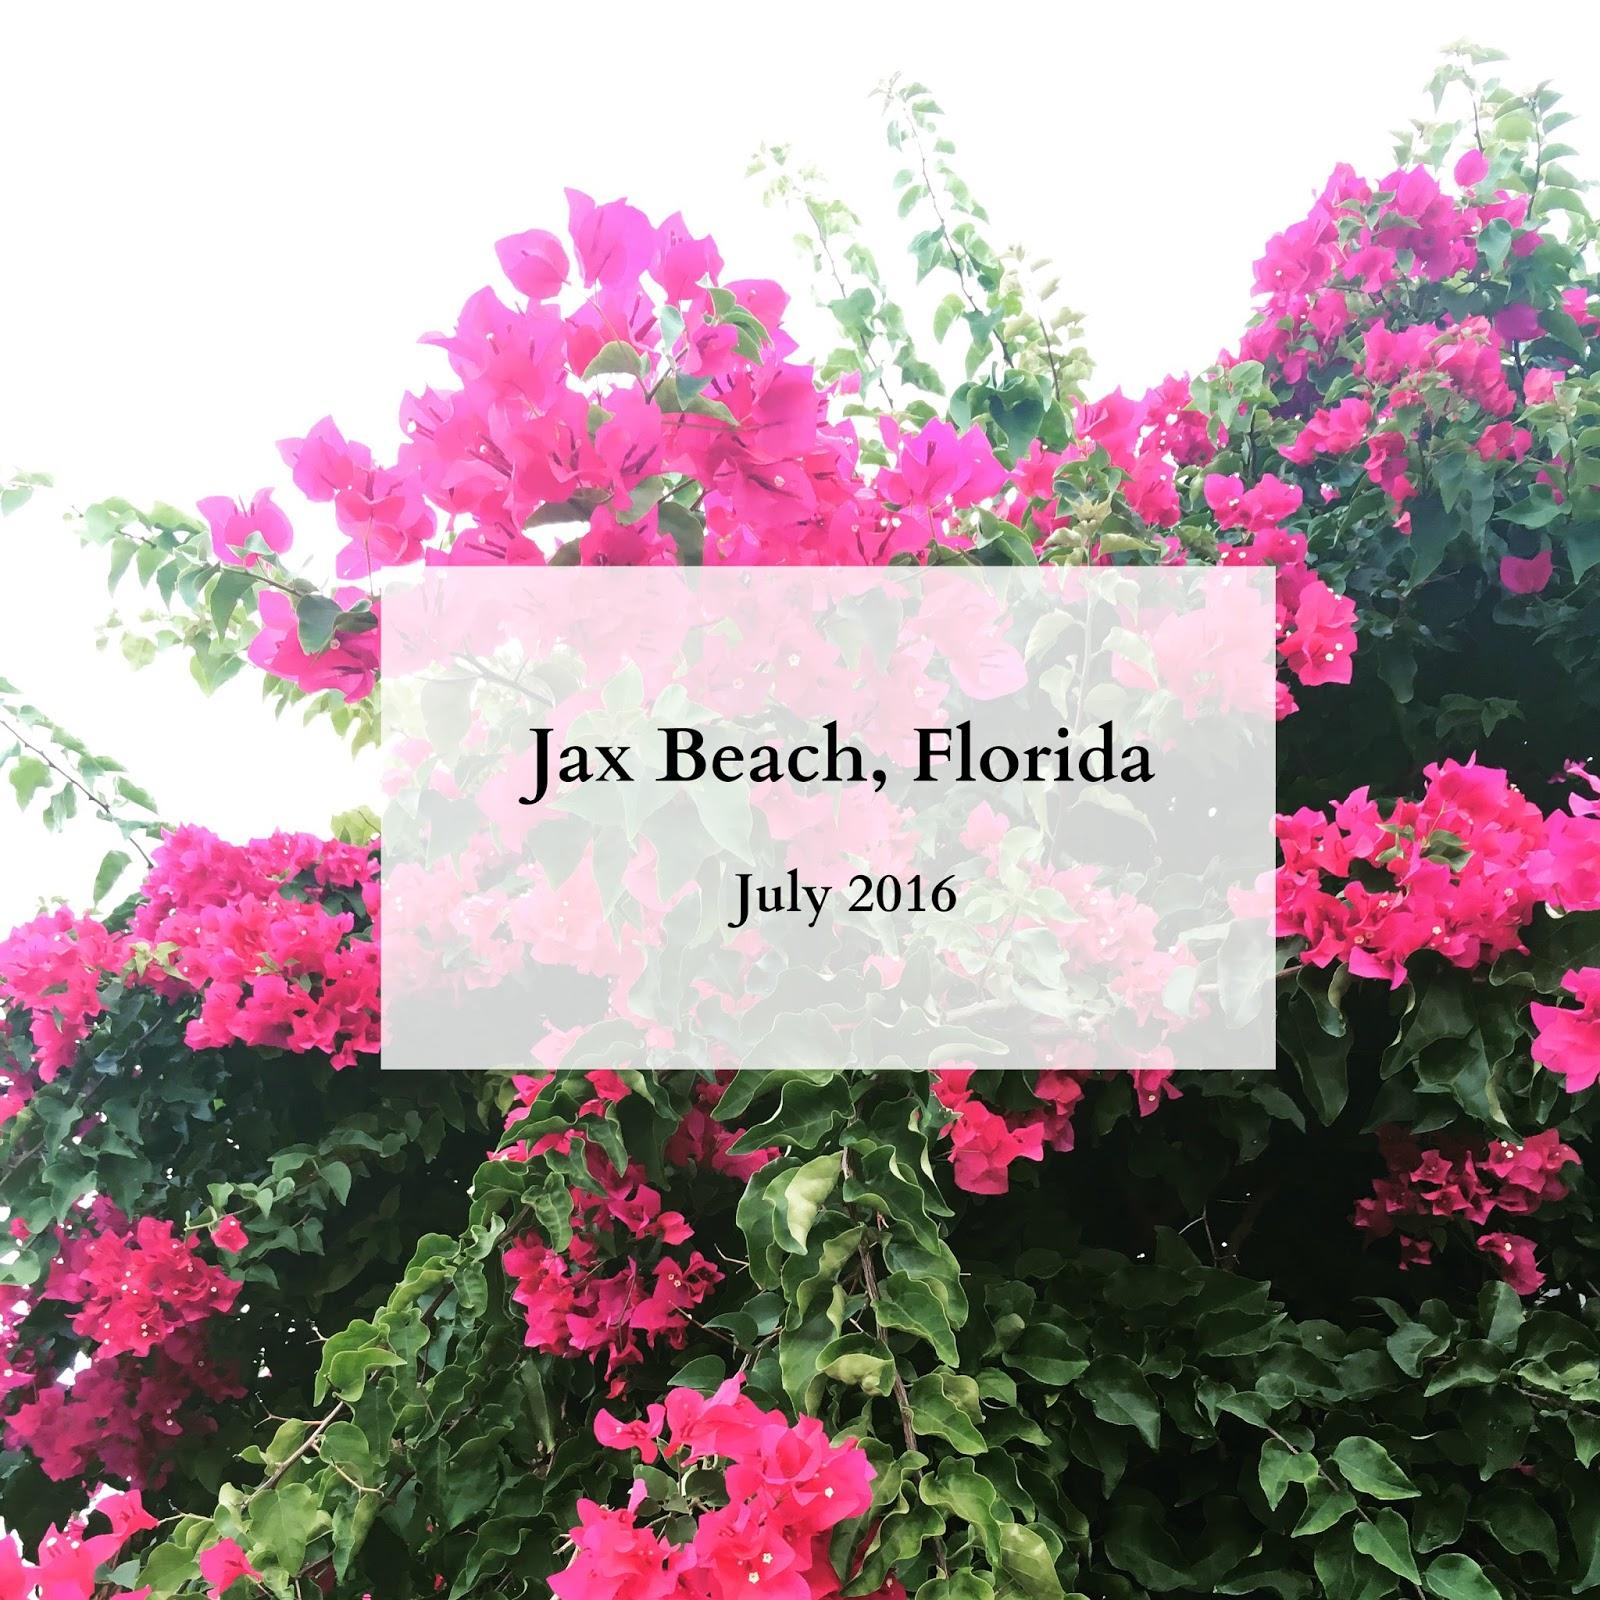 jax-beach